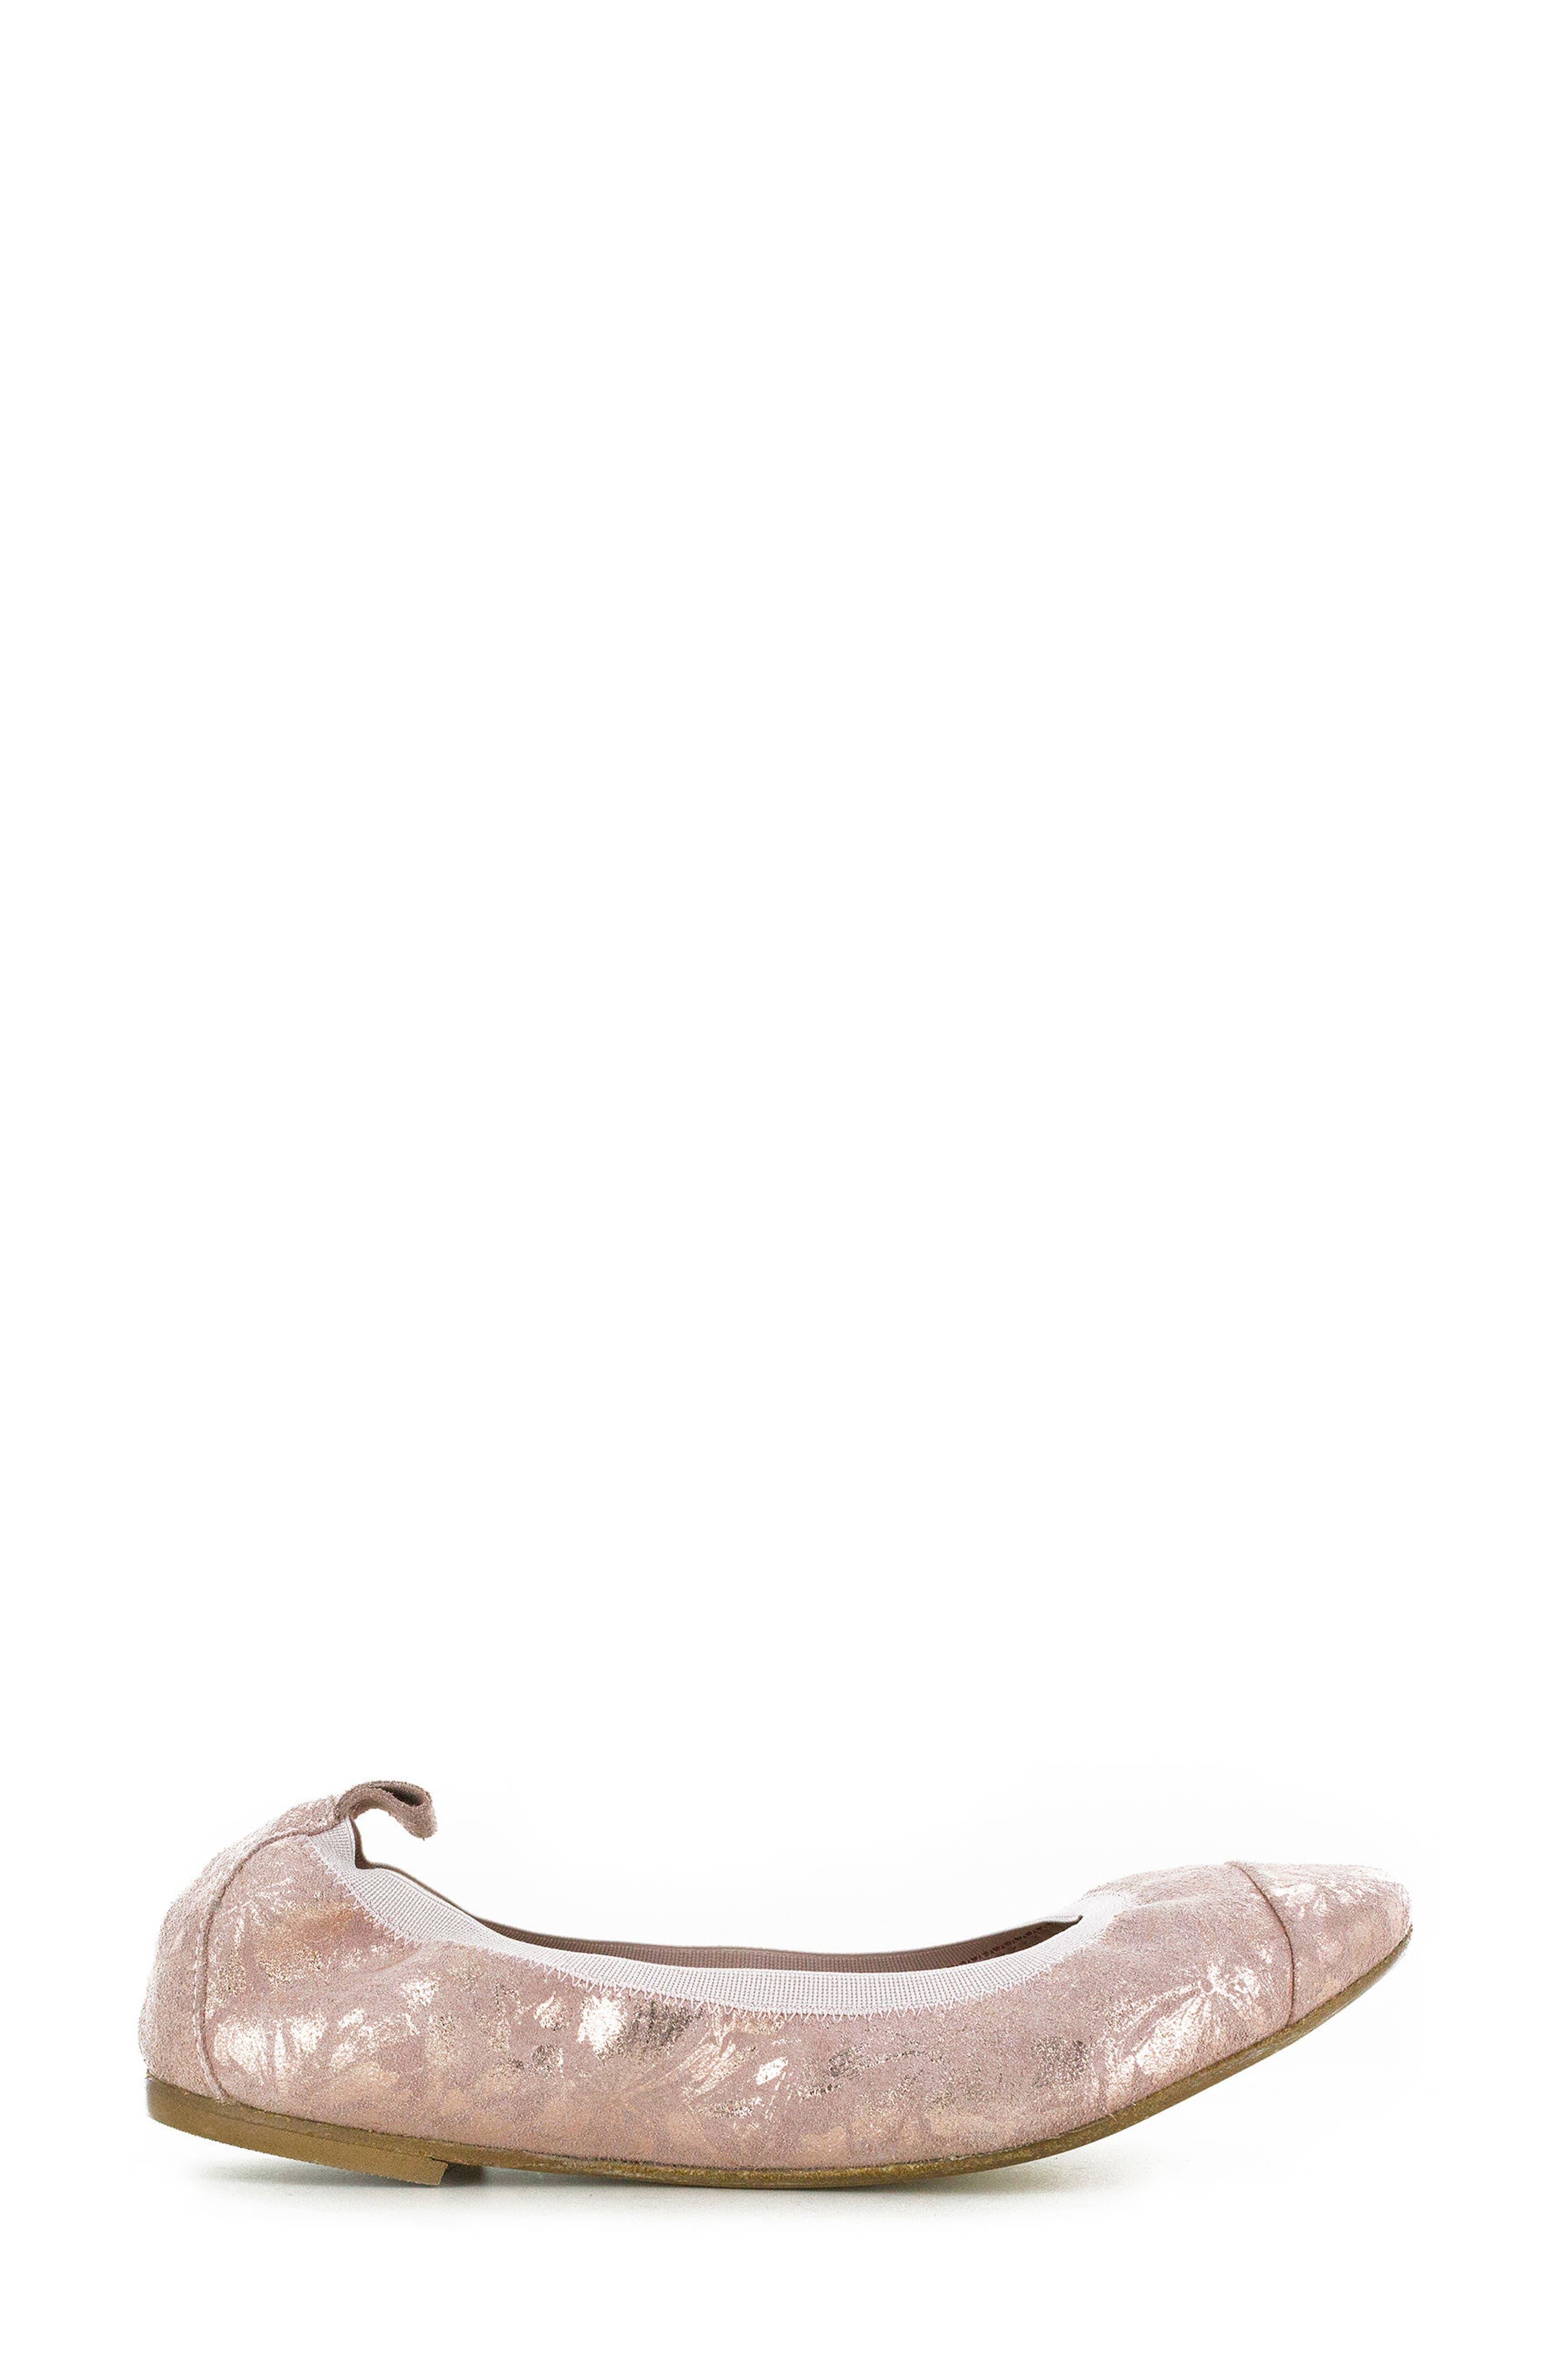 Summit Kara Ballet Flat,                             Alternate thumbnail 20, color,